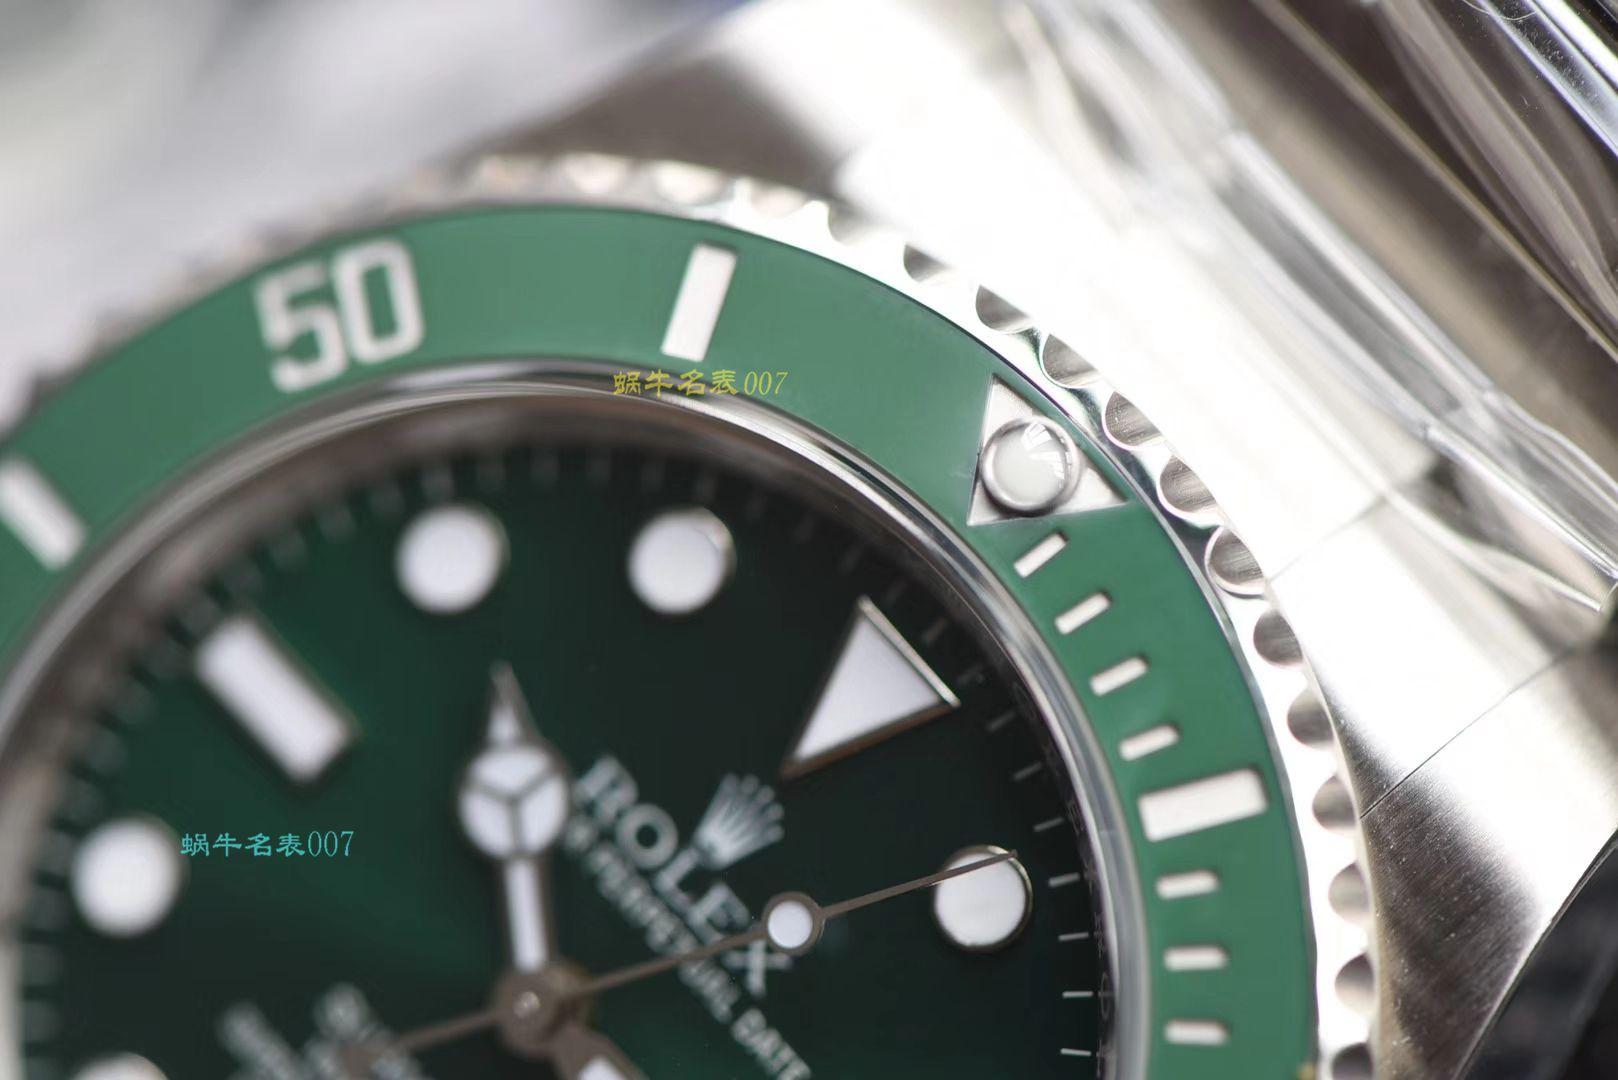 【AR厂一比一超A高仿劳力士绿水鬼手表】劳力士潜航者型系列116610LV-97200 绿盘腕表 / R318